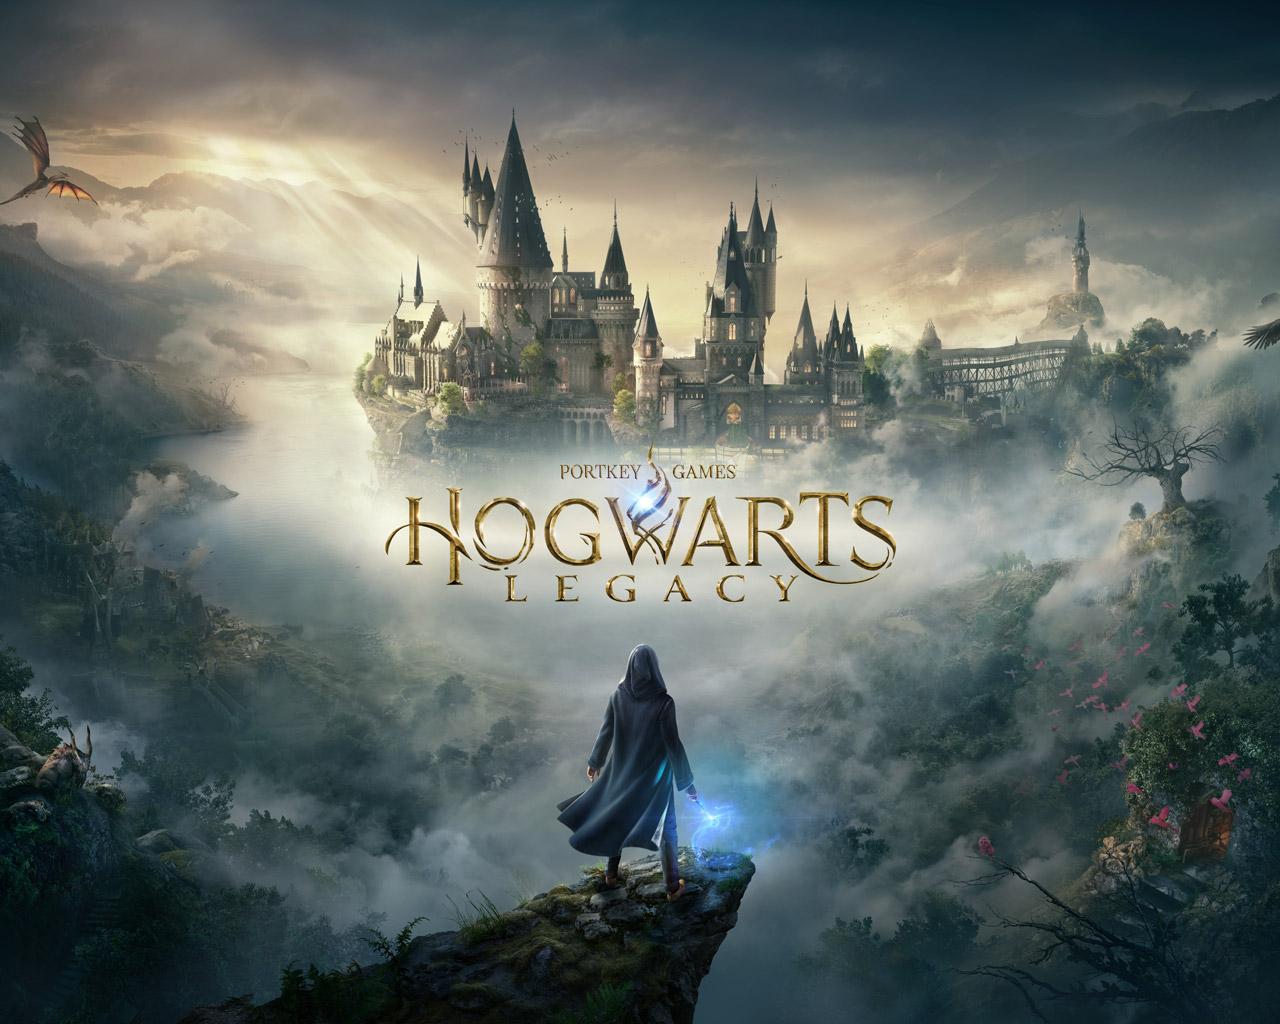 Free Hogwarts Legacy Wallpaper in 1280x1024